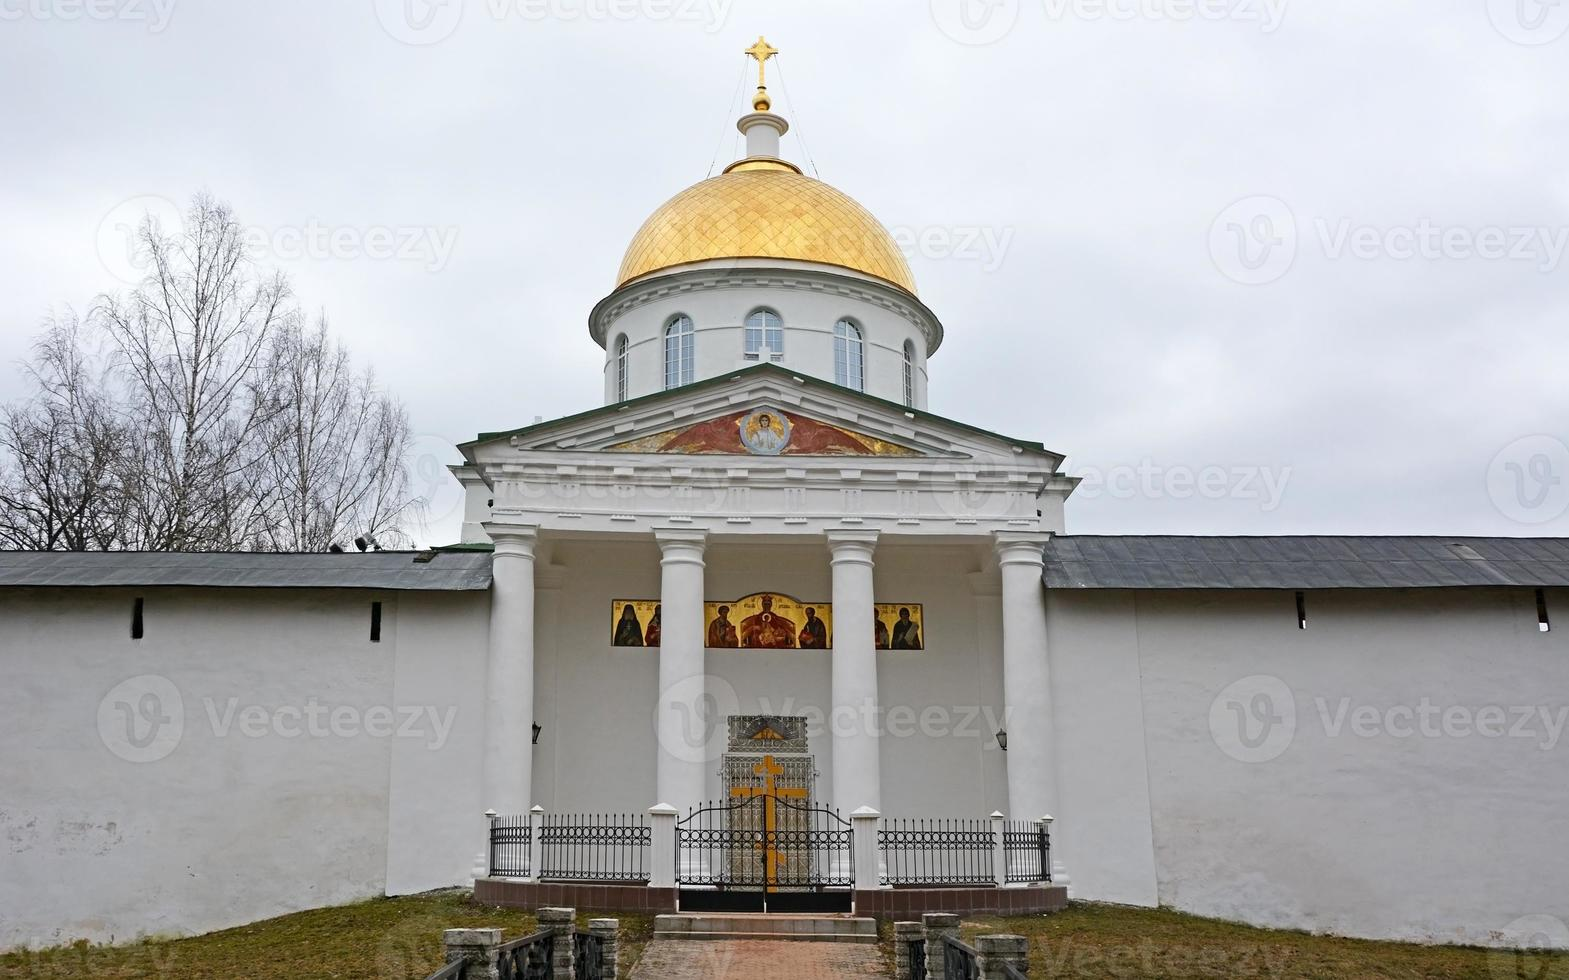 st. michael's kathedraal van het pskov-grotten heilige slaapzaal klooster foto